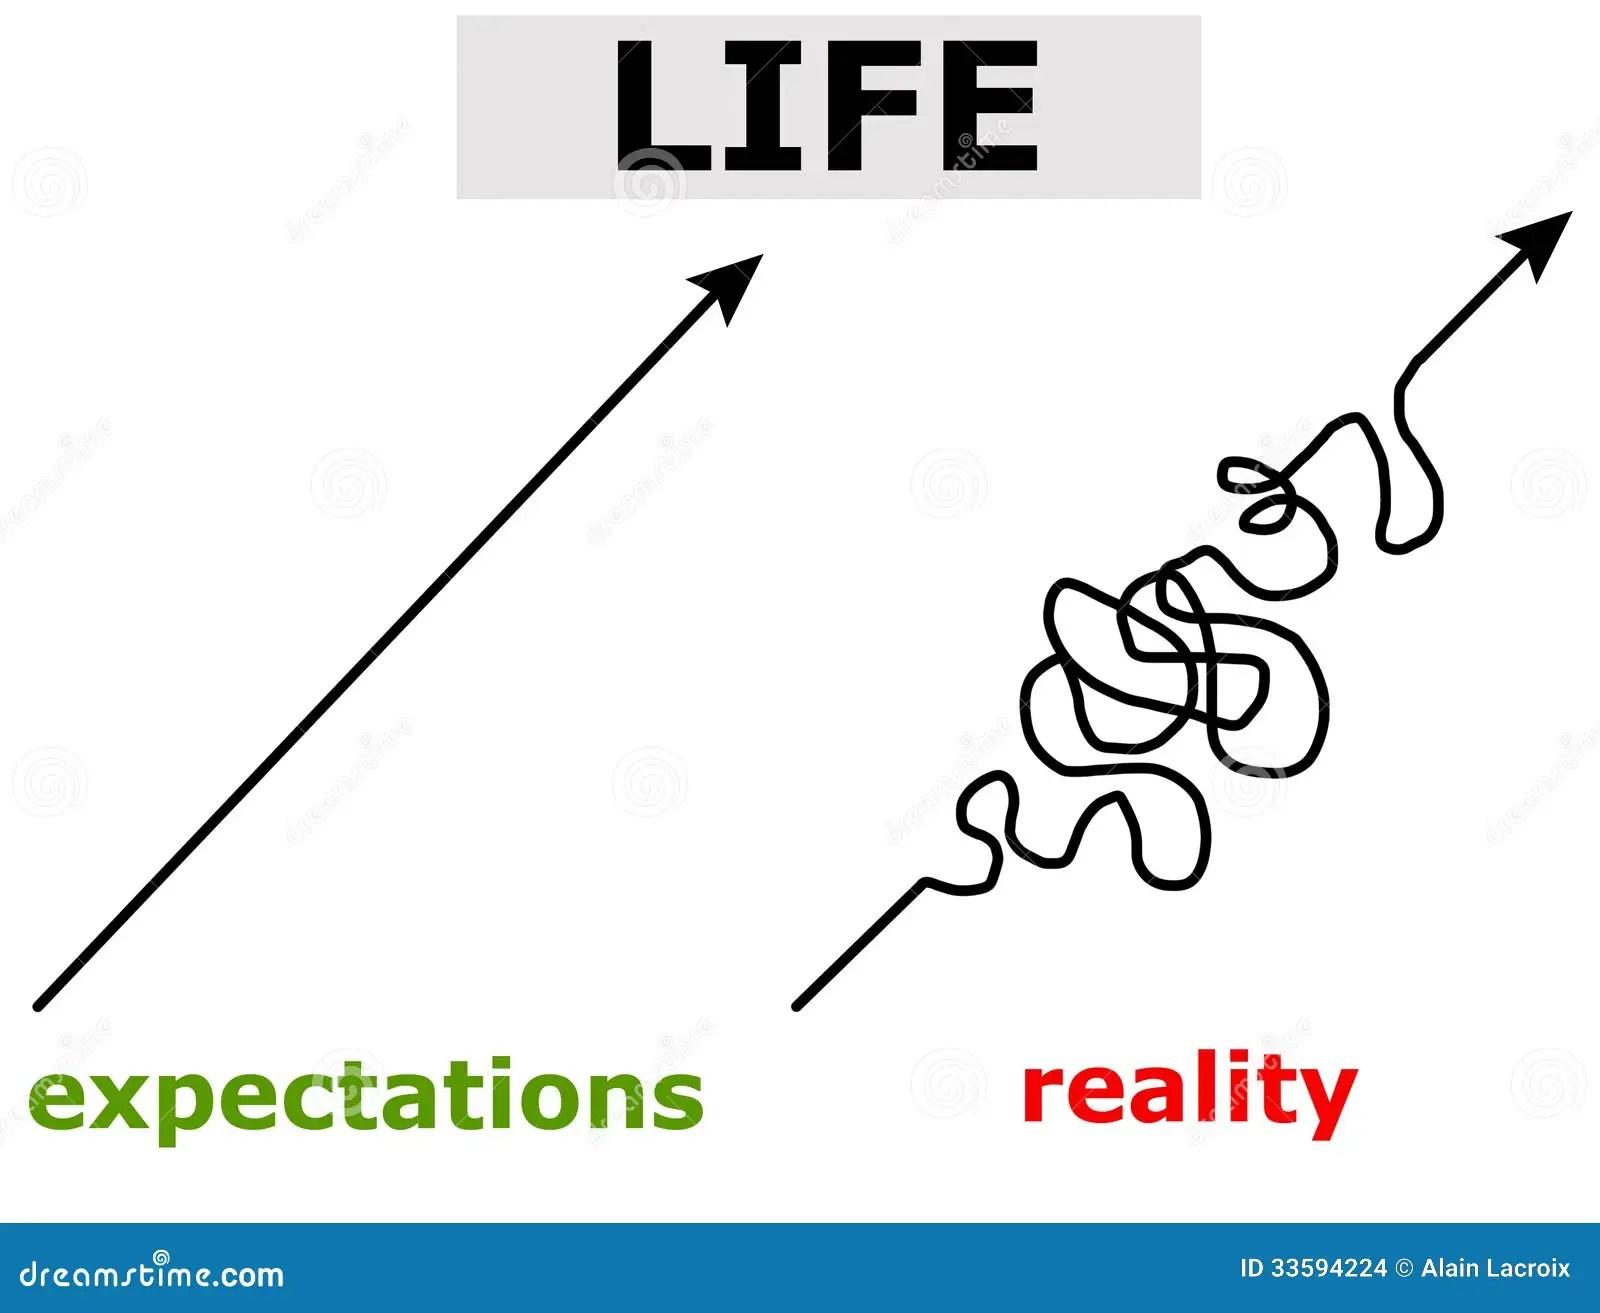 Life expectations stock illustration. Illustration of